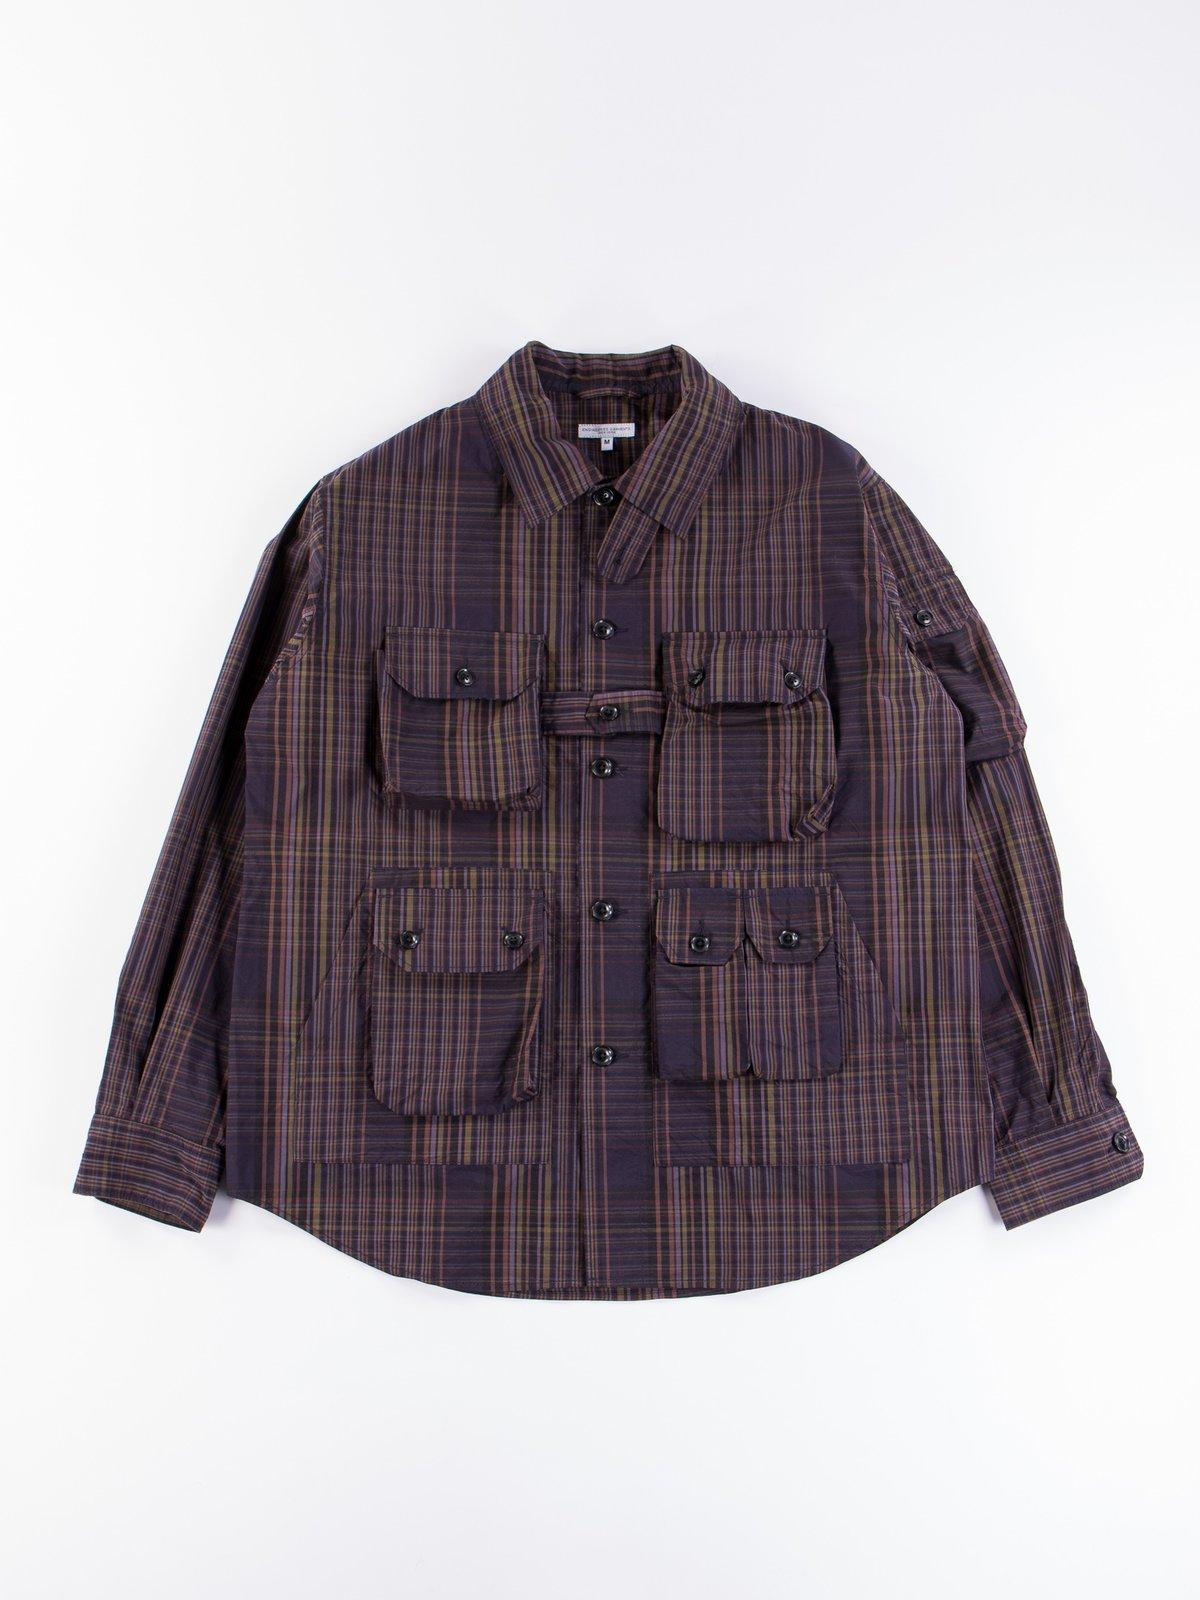 Multi Color Nyco Plaid Explorer Shirt Jacket - Image 1